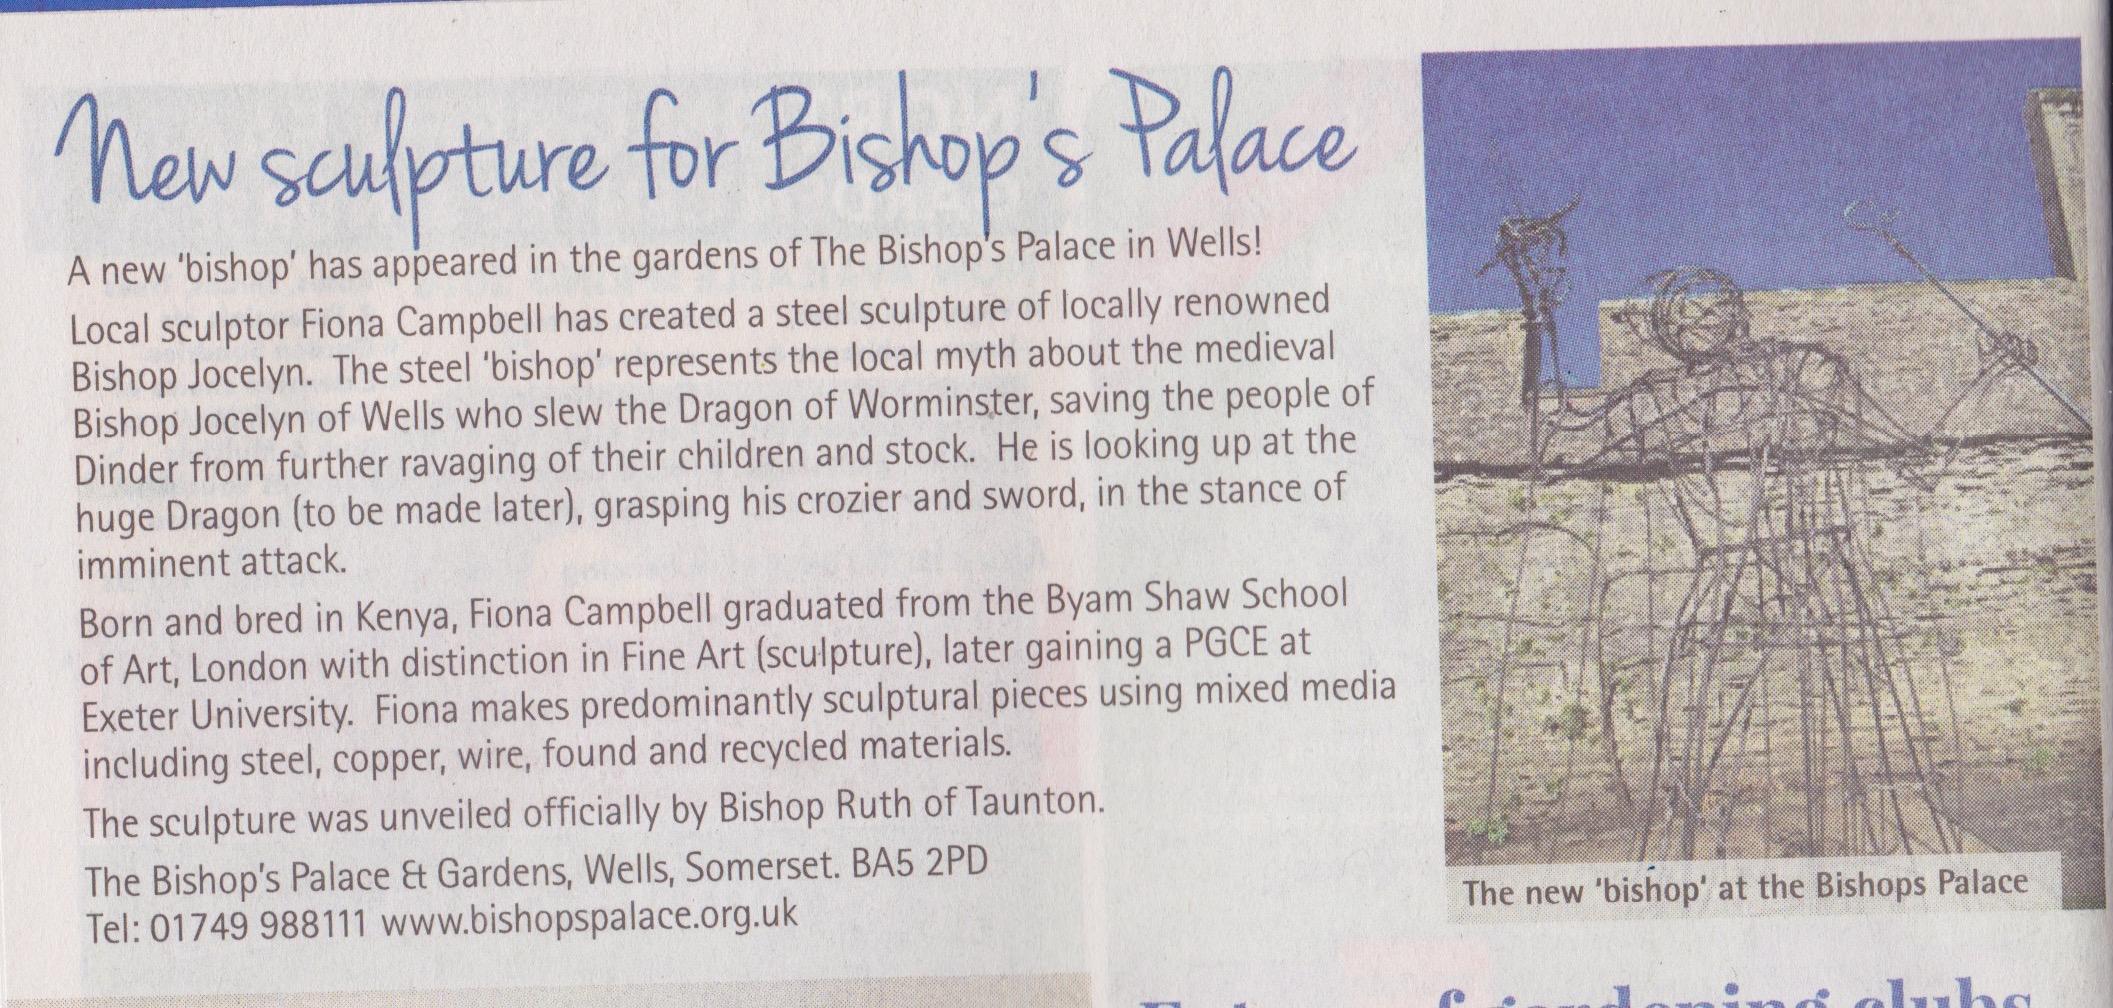 Bishop - Country Gardener